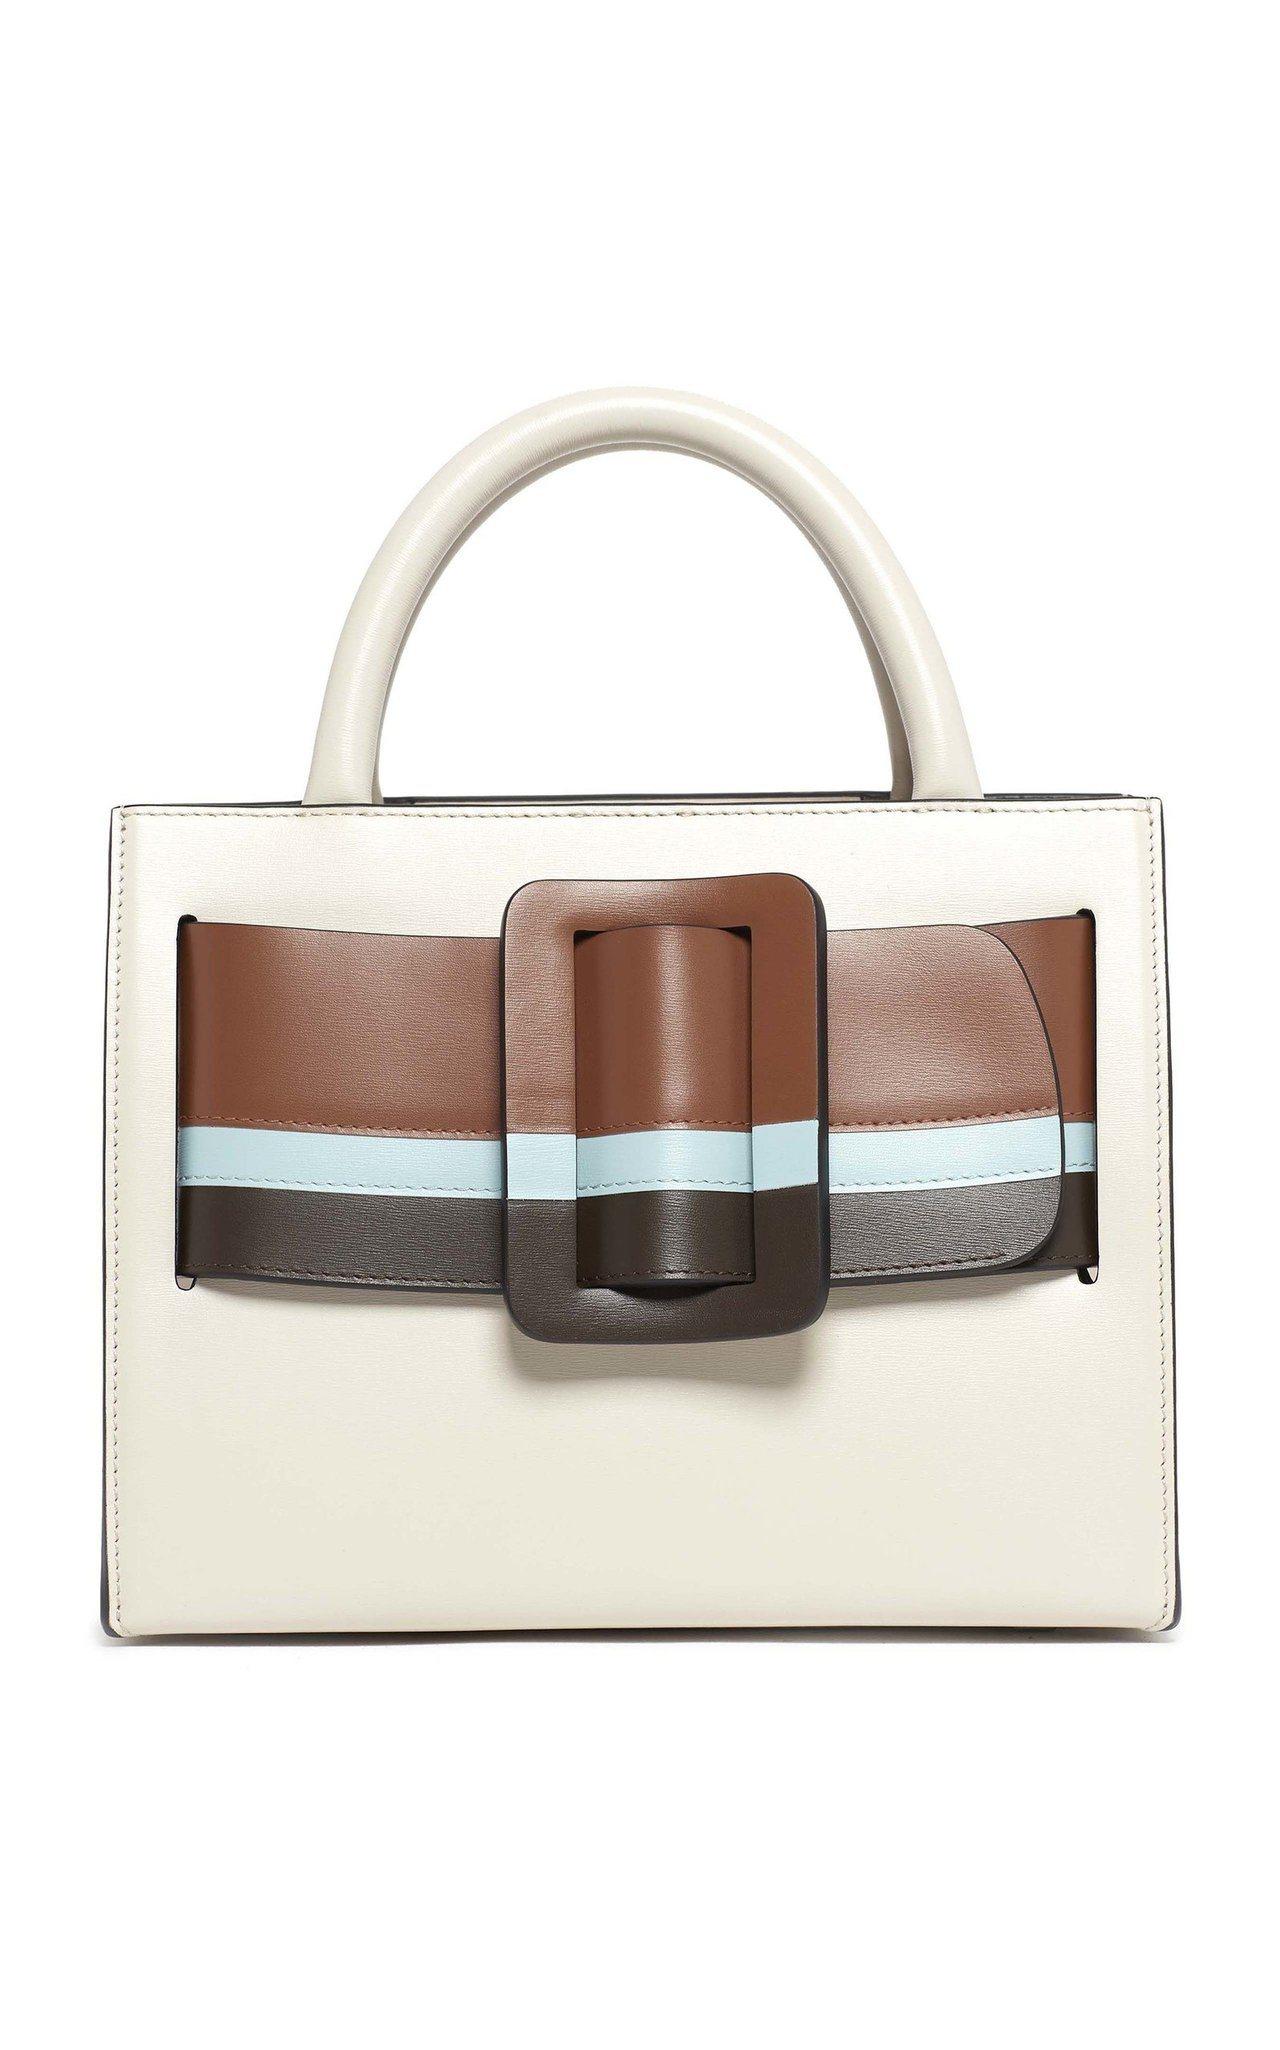 BOYY Bobby23多色釦環手提包,售價36,980元。圖/ARTIFACT...